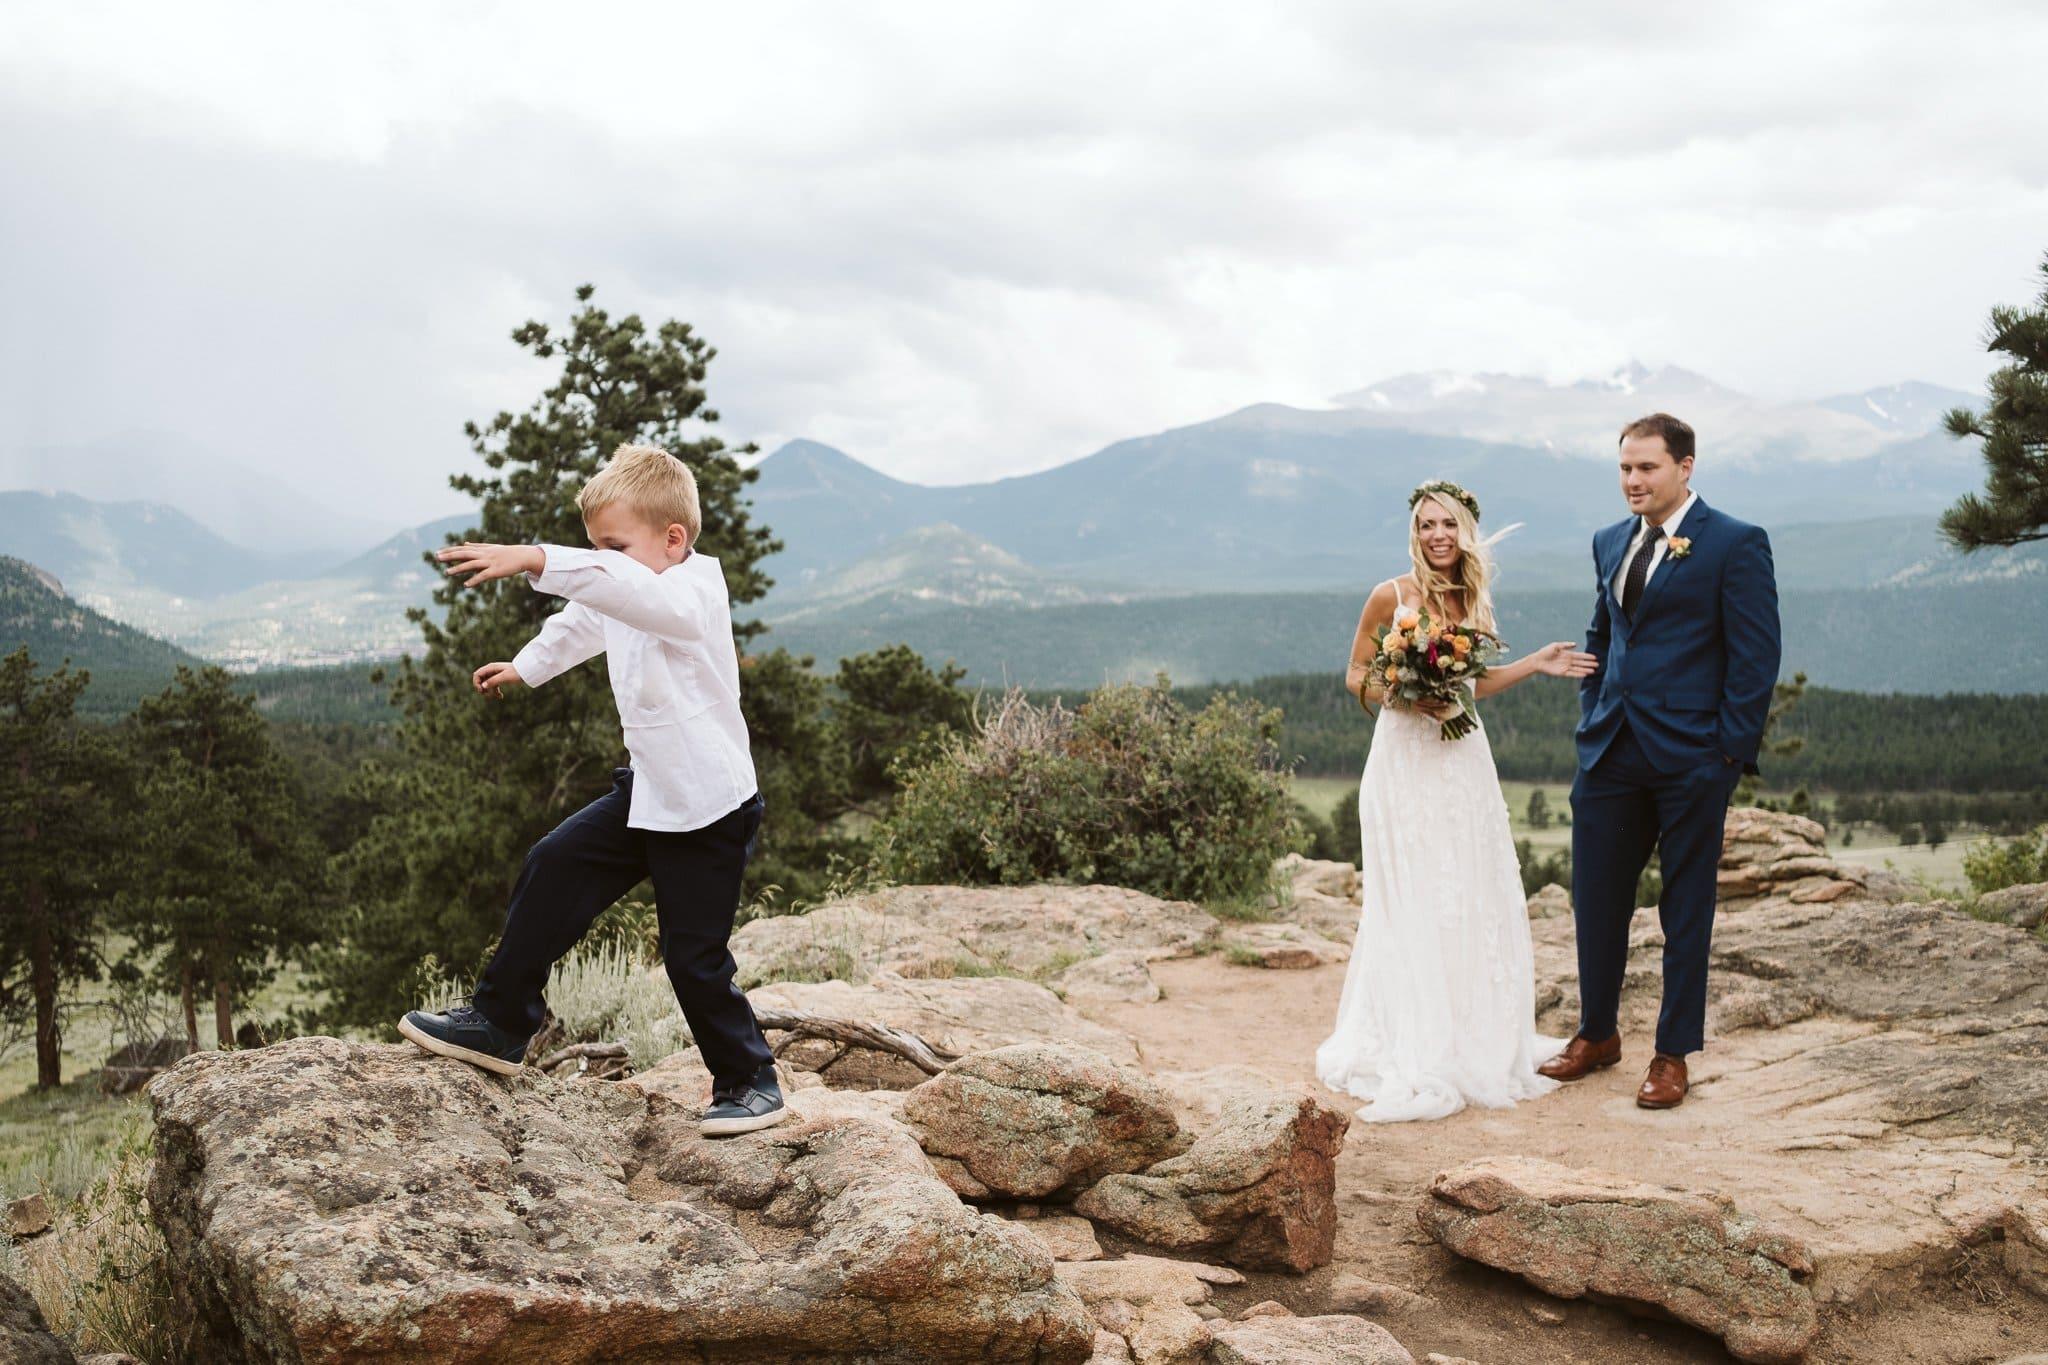 Wedding photos at 3M Curve in Rocky Mountain National Park, Estes Park wedding, Colorado wedding photographer, bride and groom with son